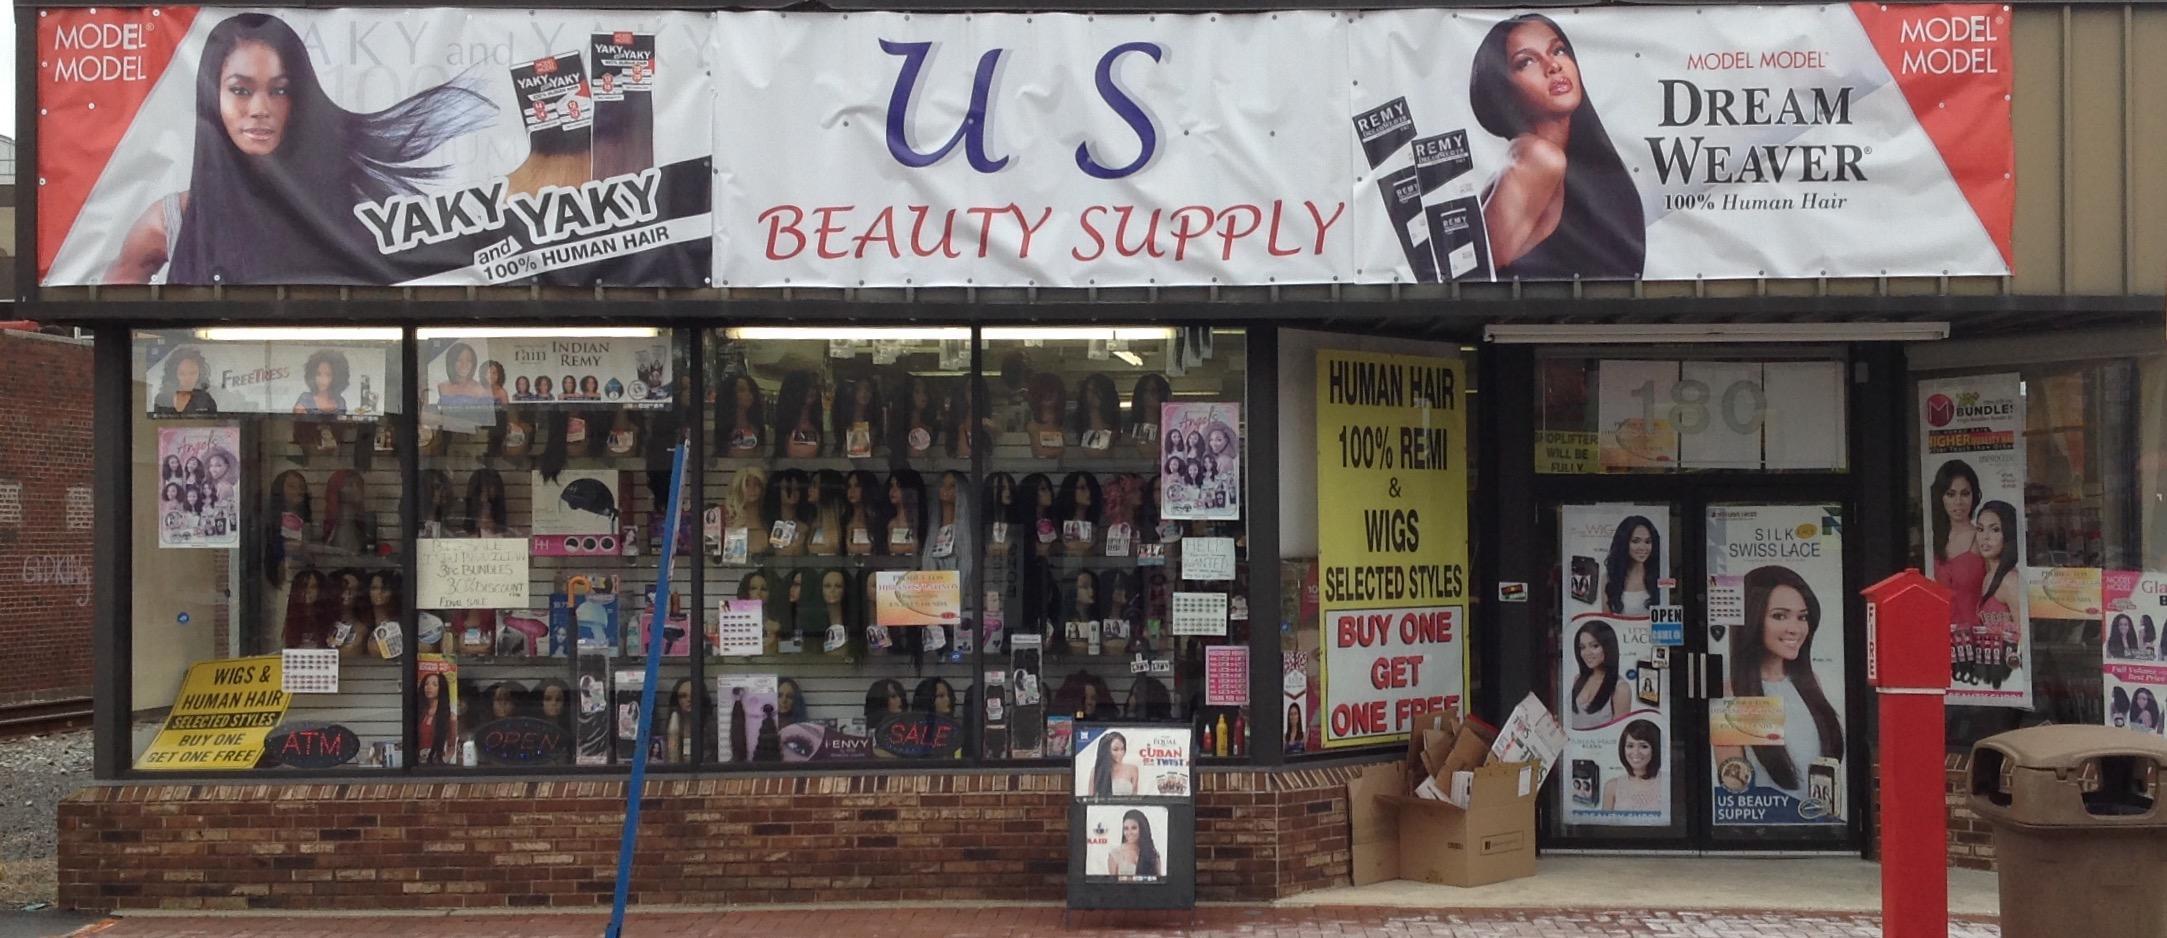 U.S. Beauty Supply image 3